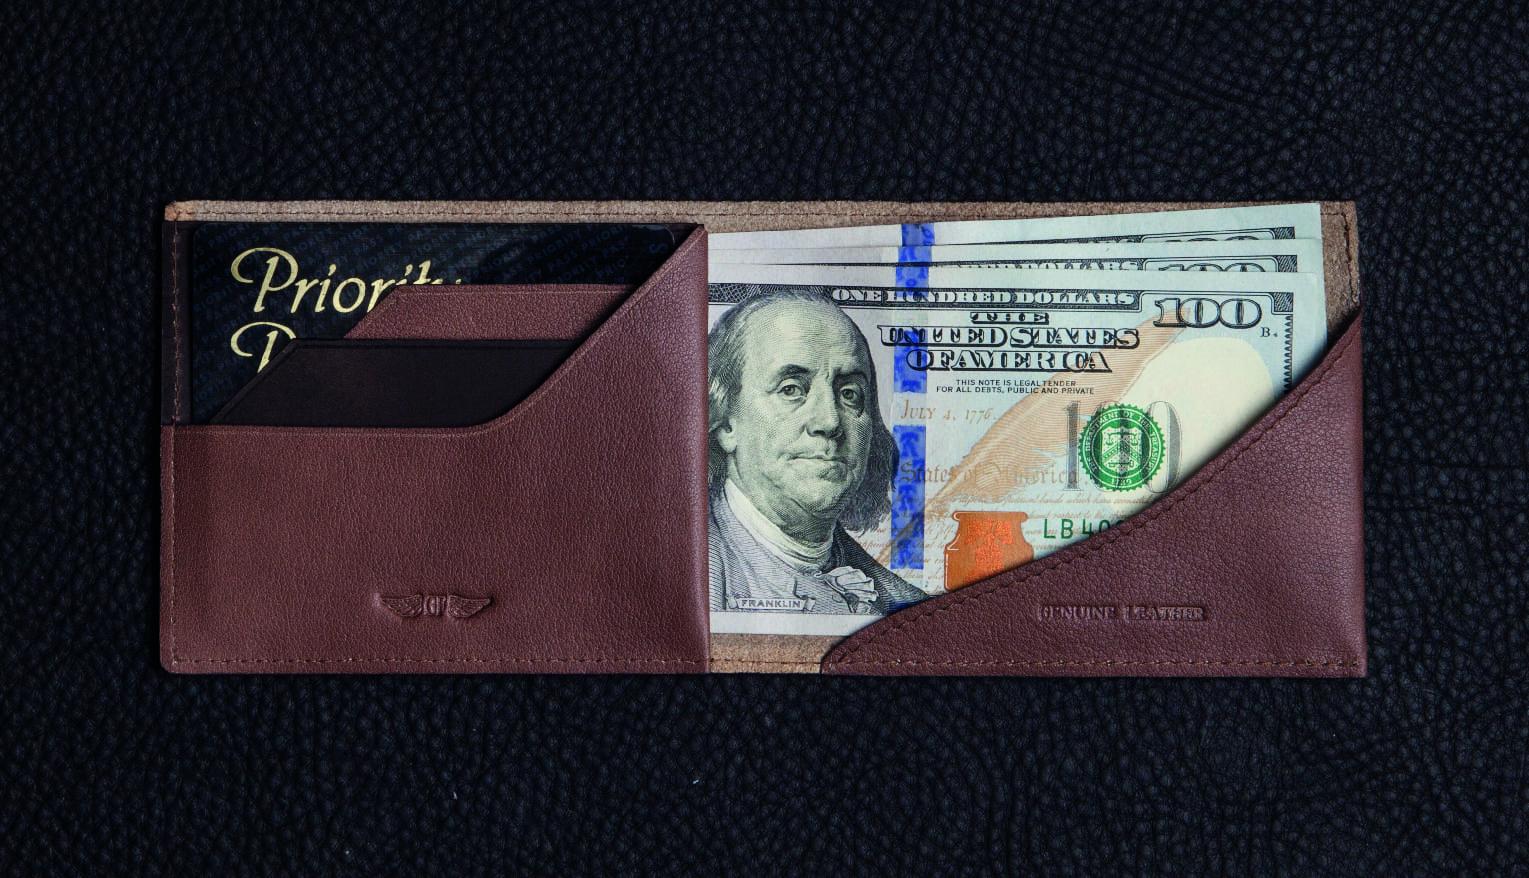 Thinnest Wallet You Can Have กระเป๋าสตางค์ที่บางที่สุด